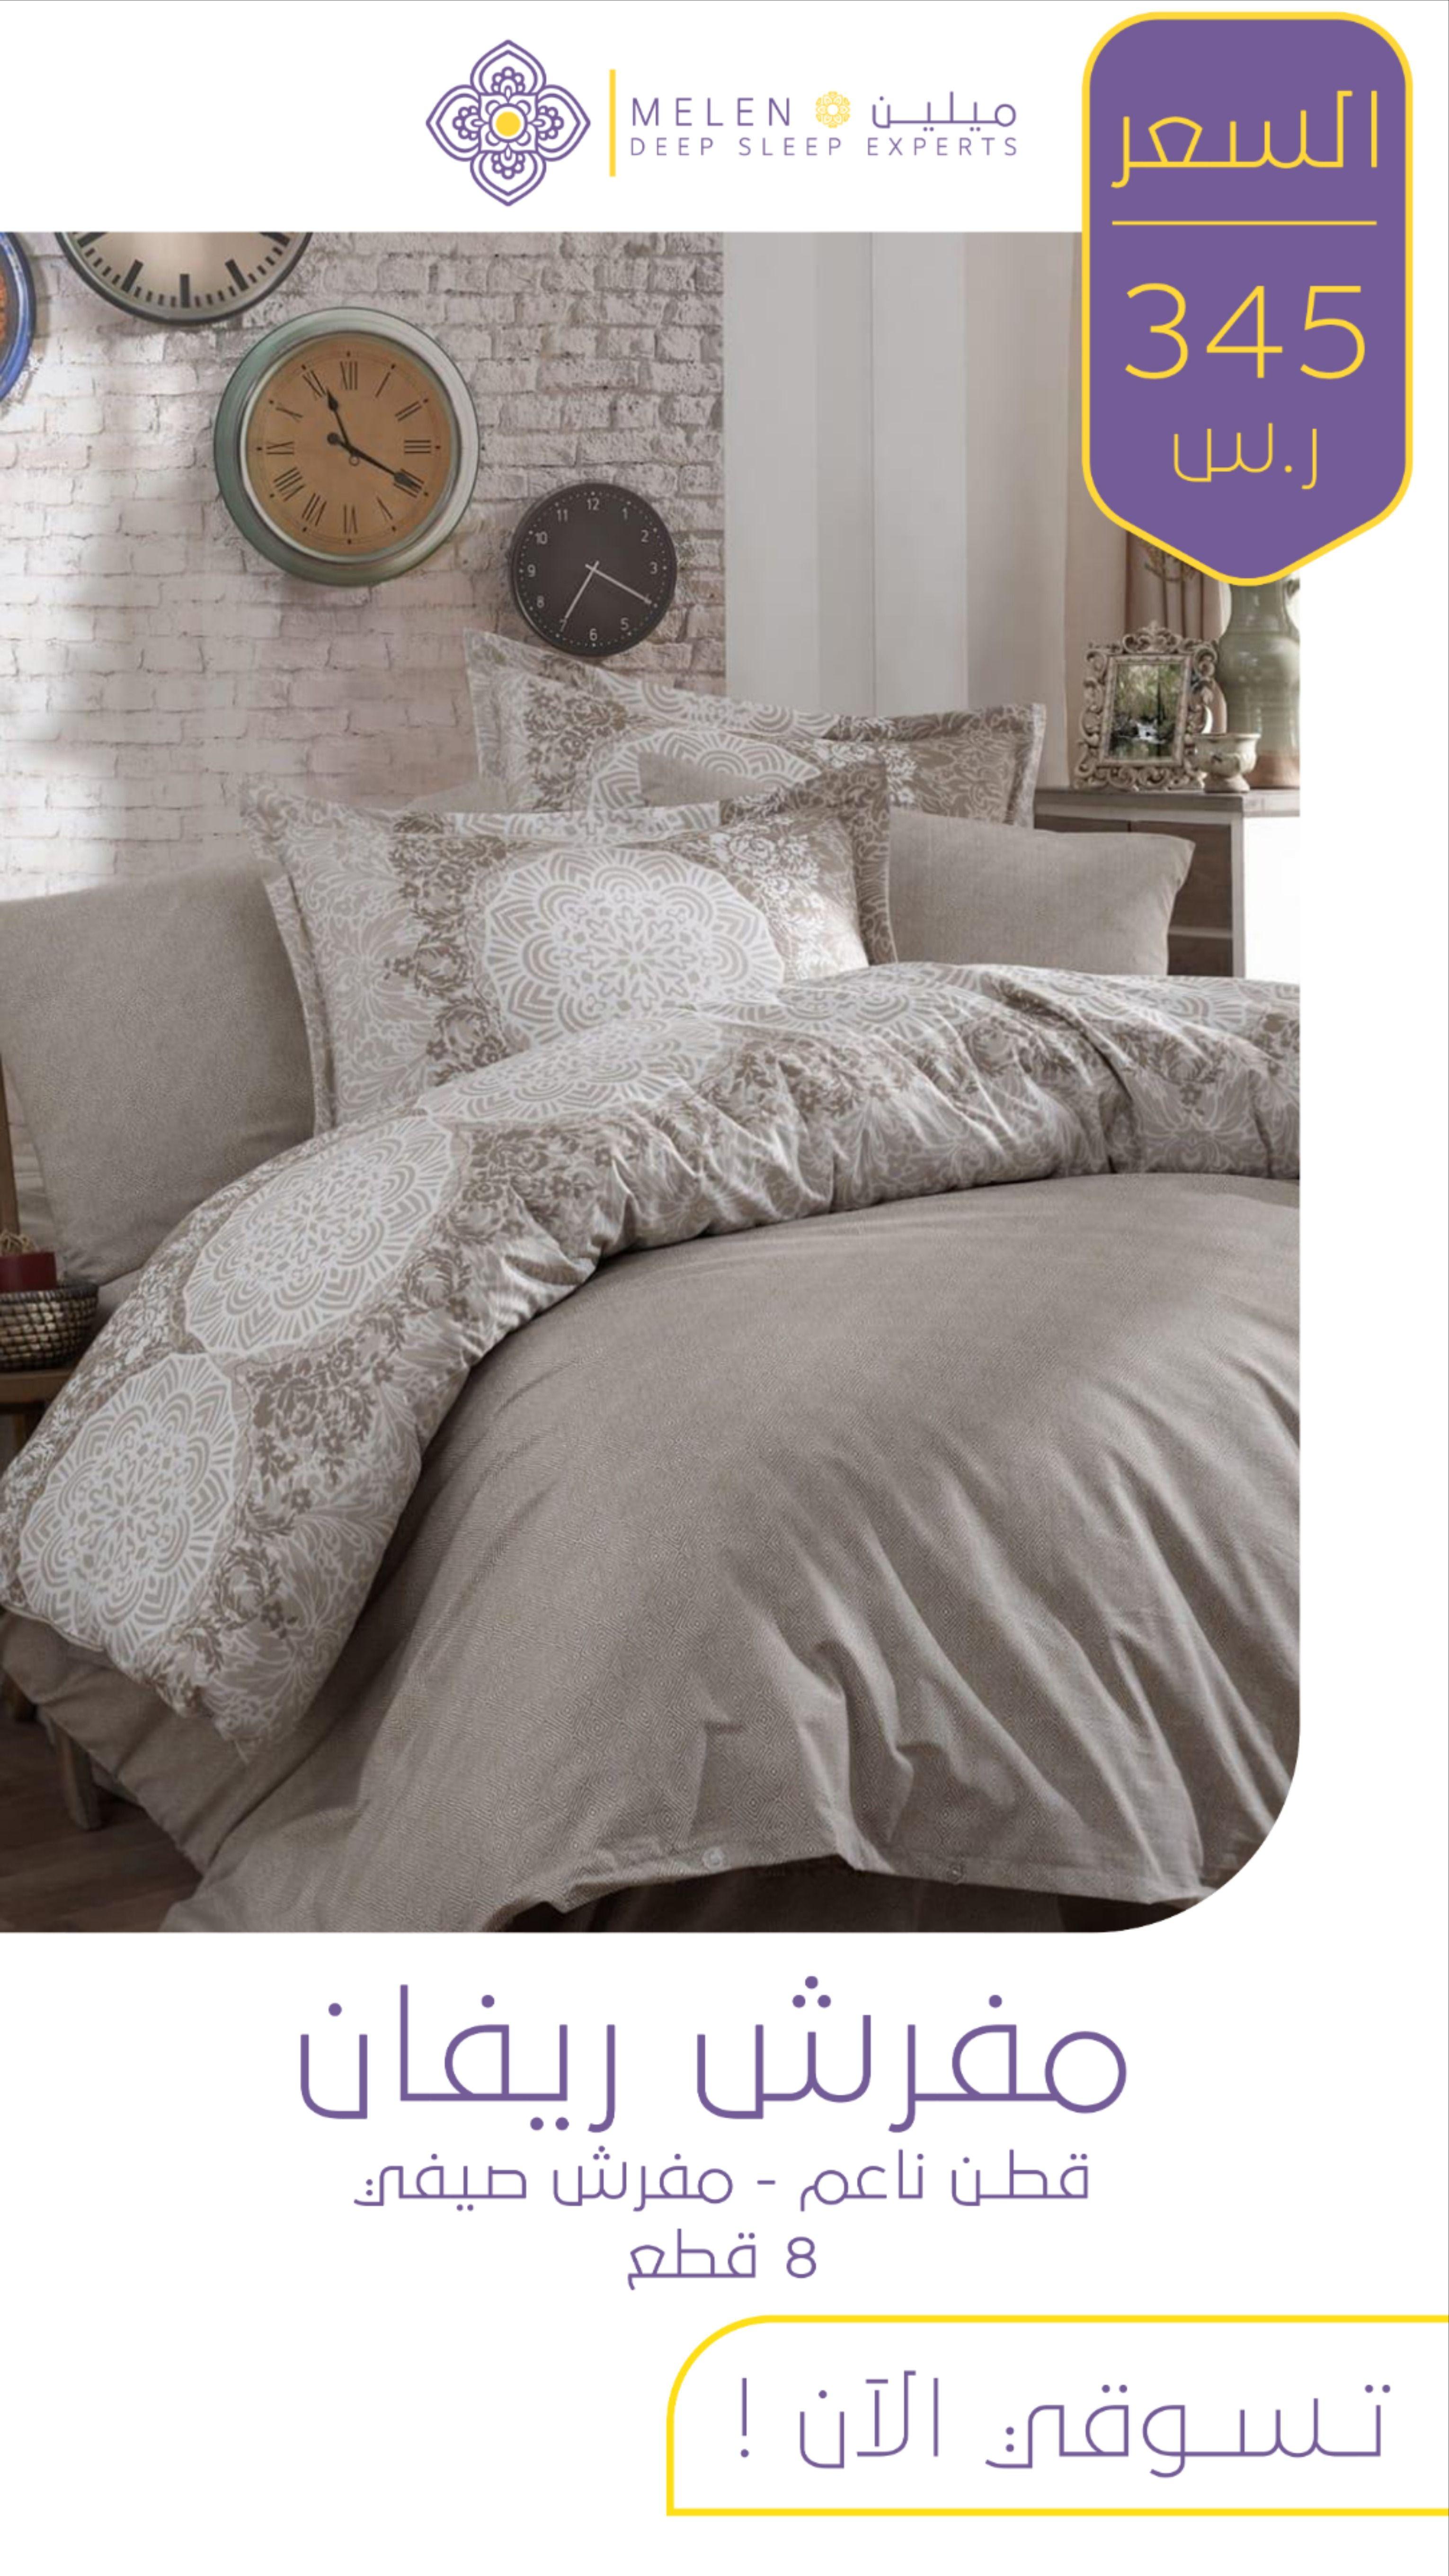 مفارش صيفية مفارش ميلين Bed Blanket Comforters